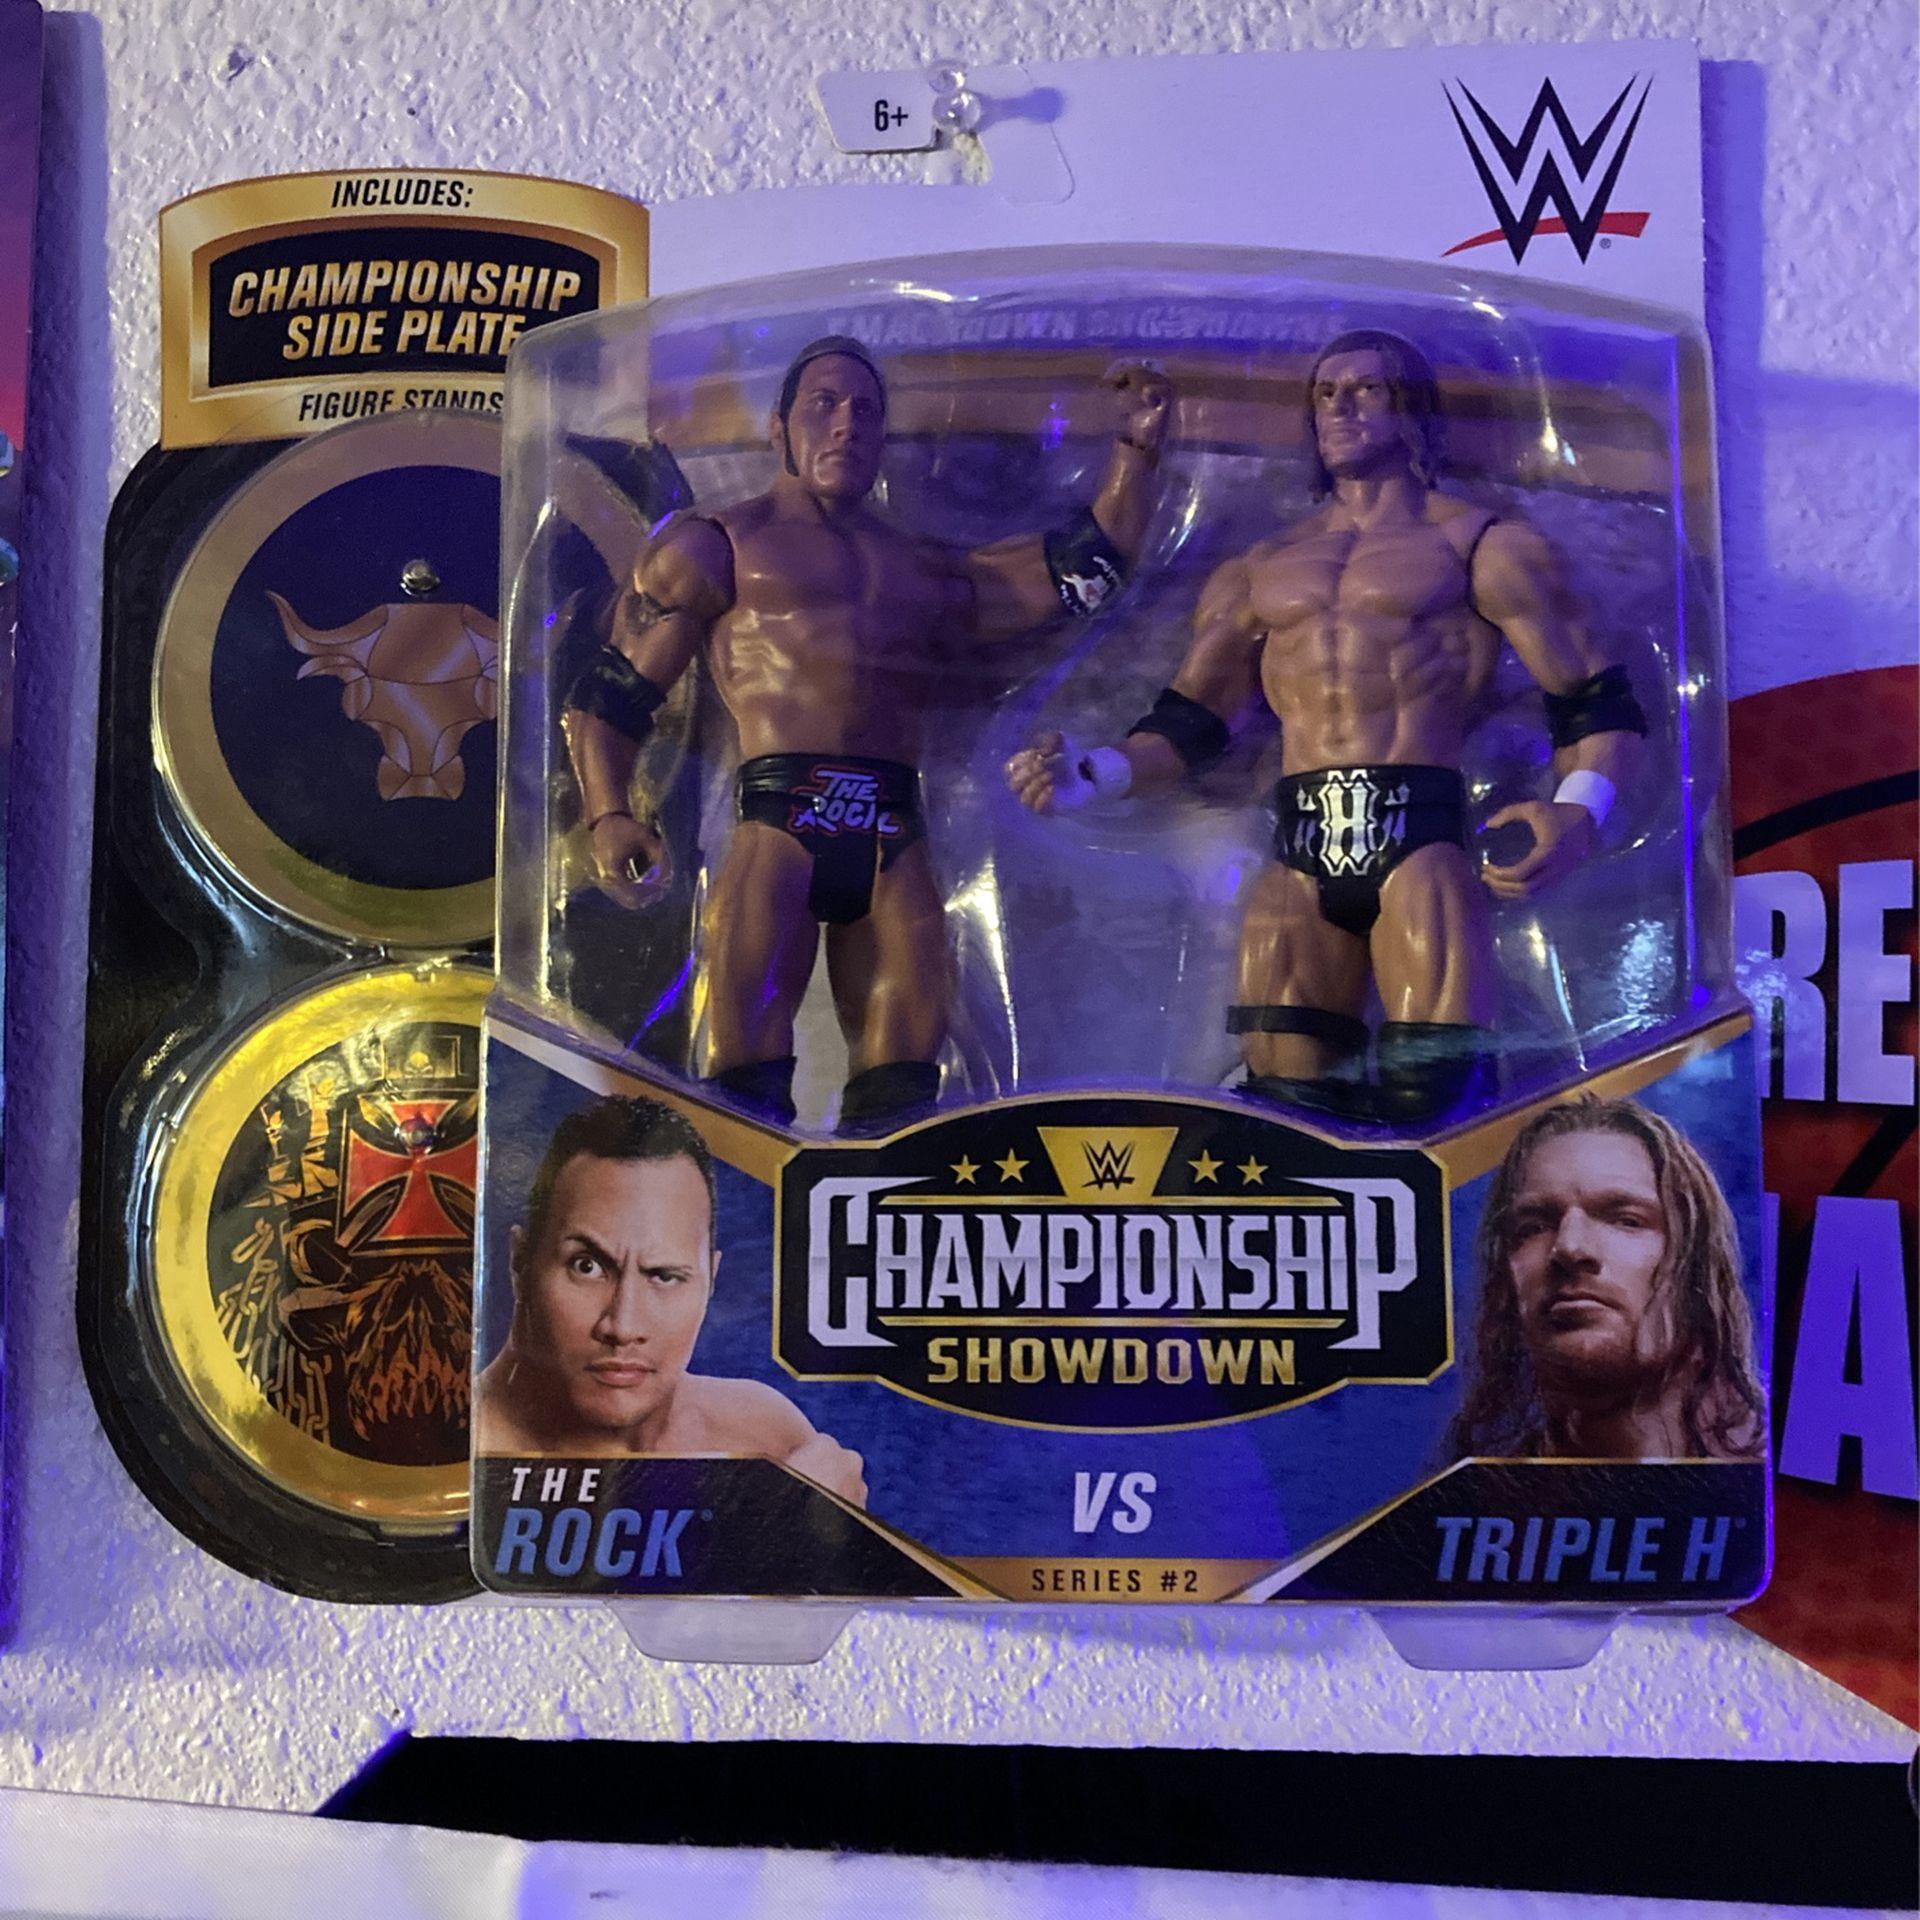 WWE CHAMPIONSHIP SHOWDOWN ACTION FIGURES